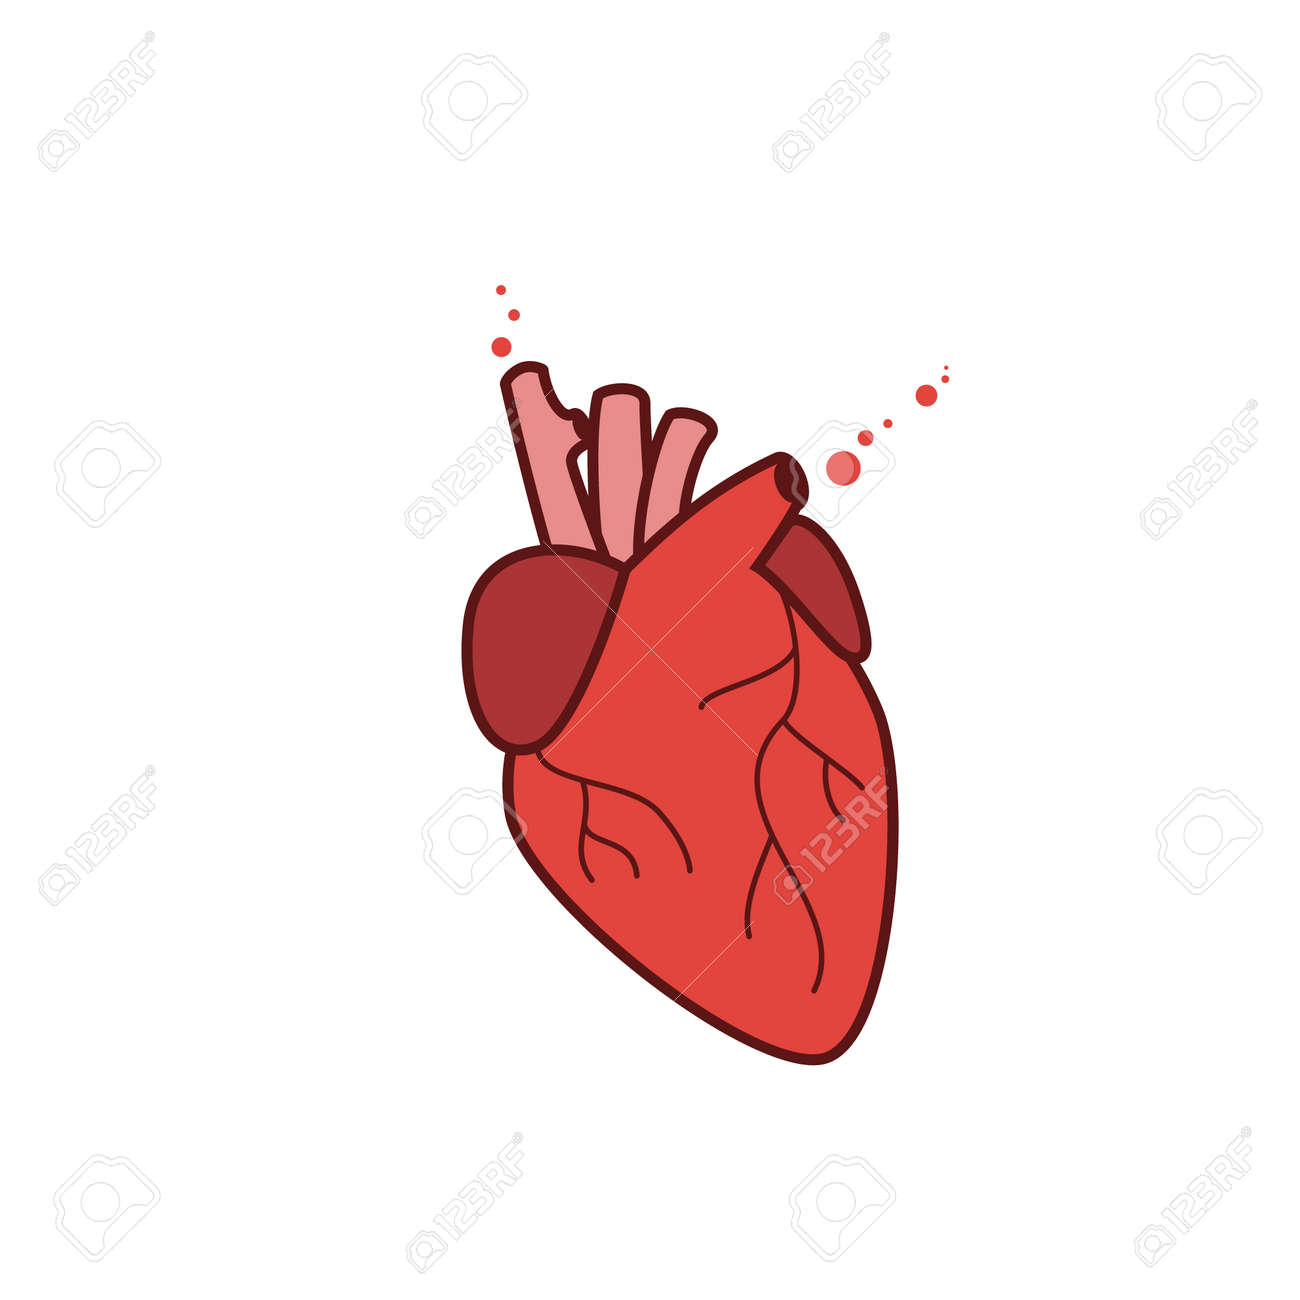 Human heart icon, vector realistic illustration